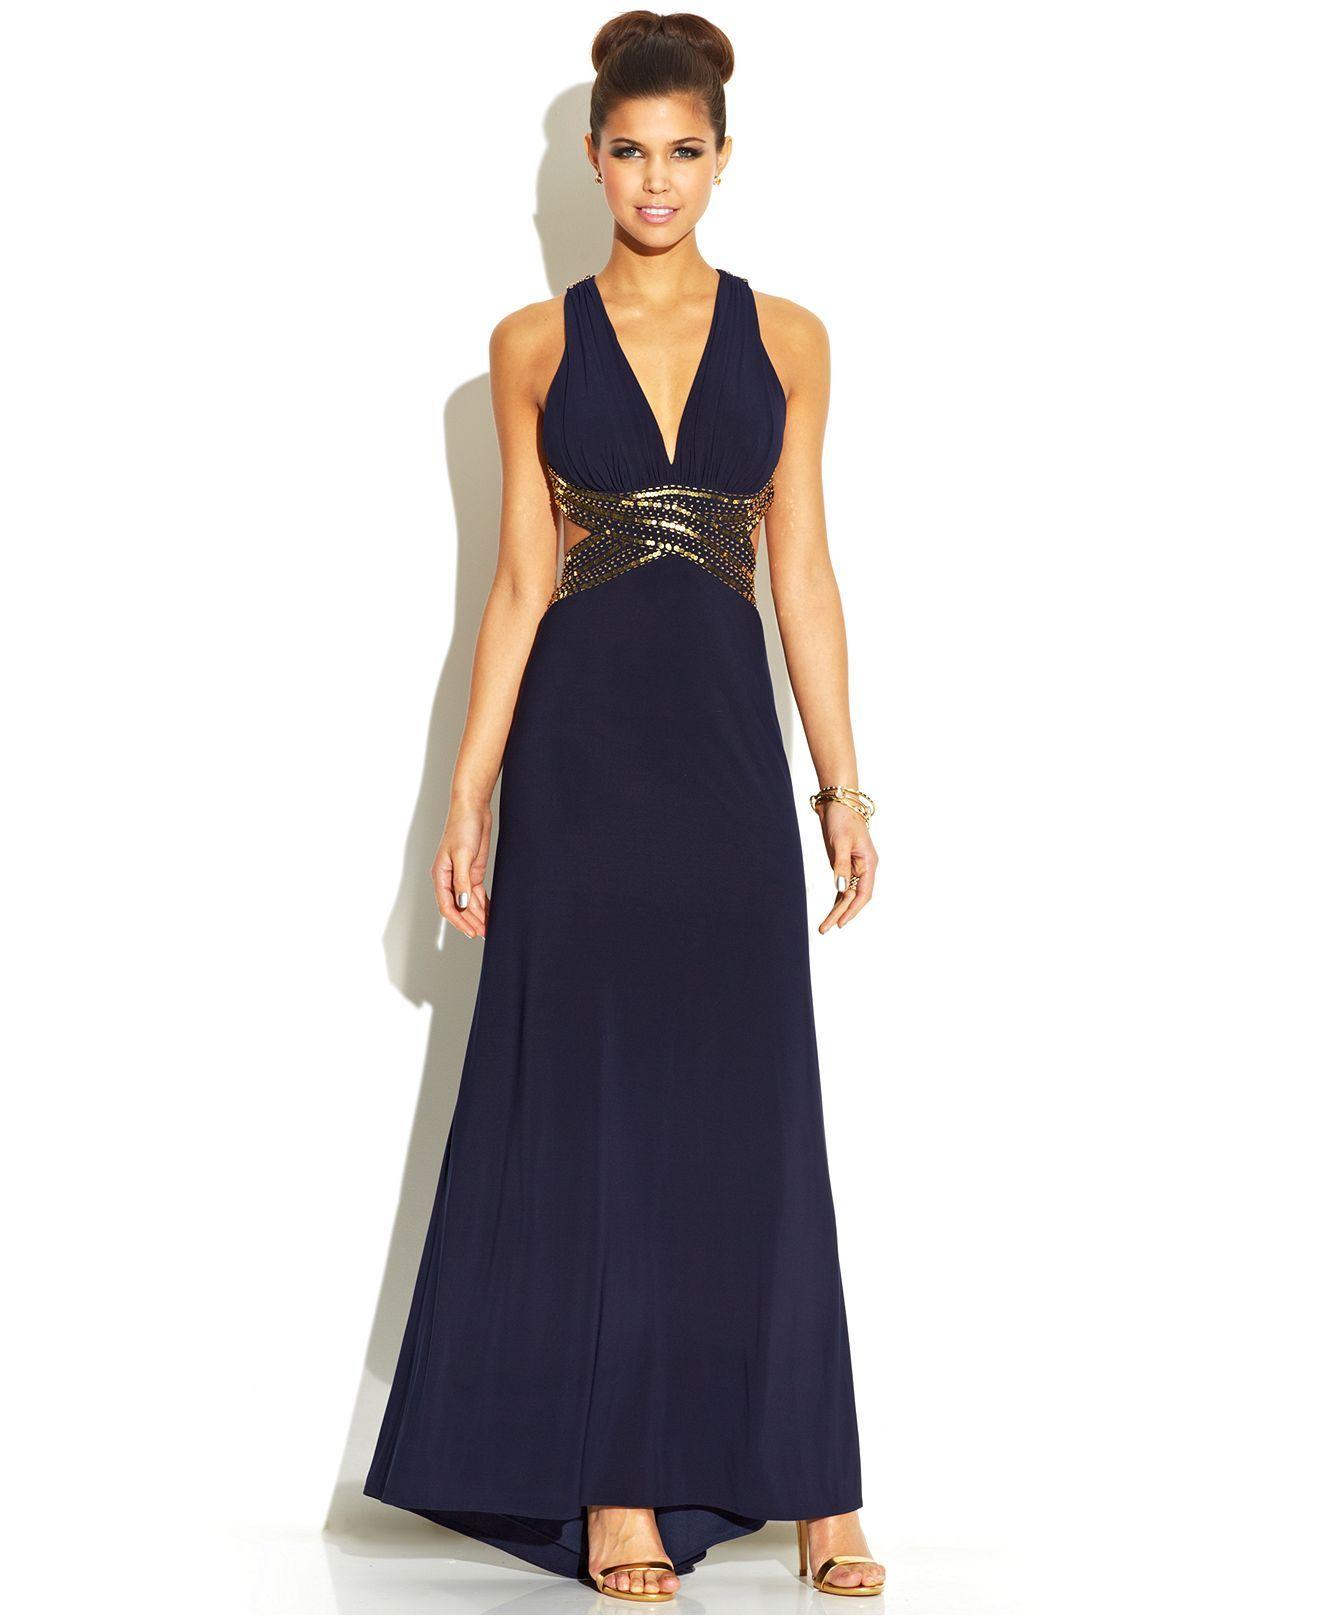 Blondie Nites Juniors\' Sequined Open-Back Dress - Juniors Prom ...